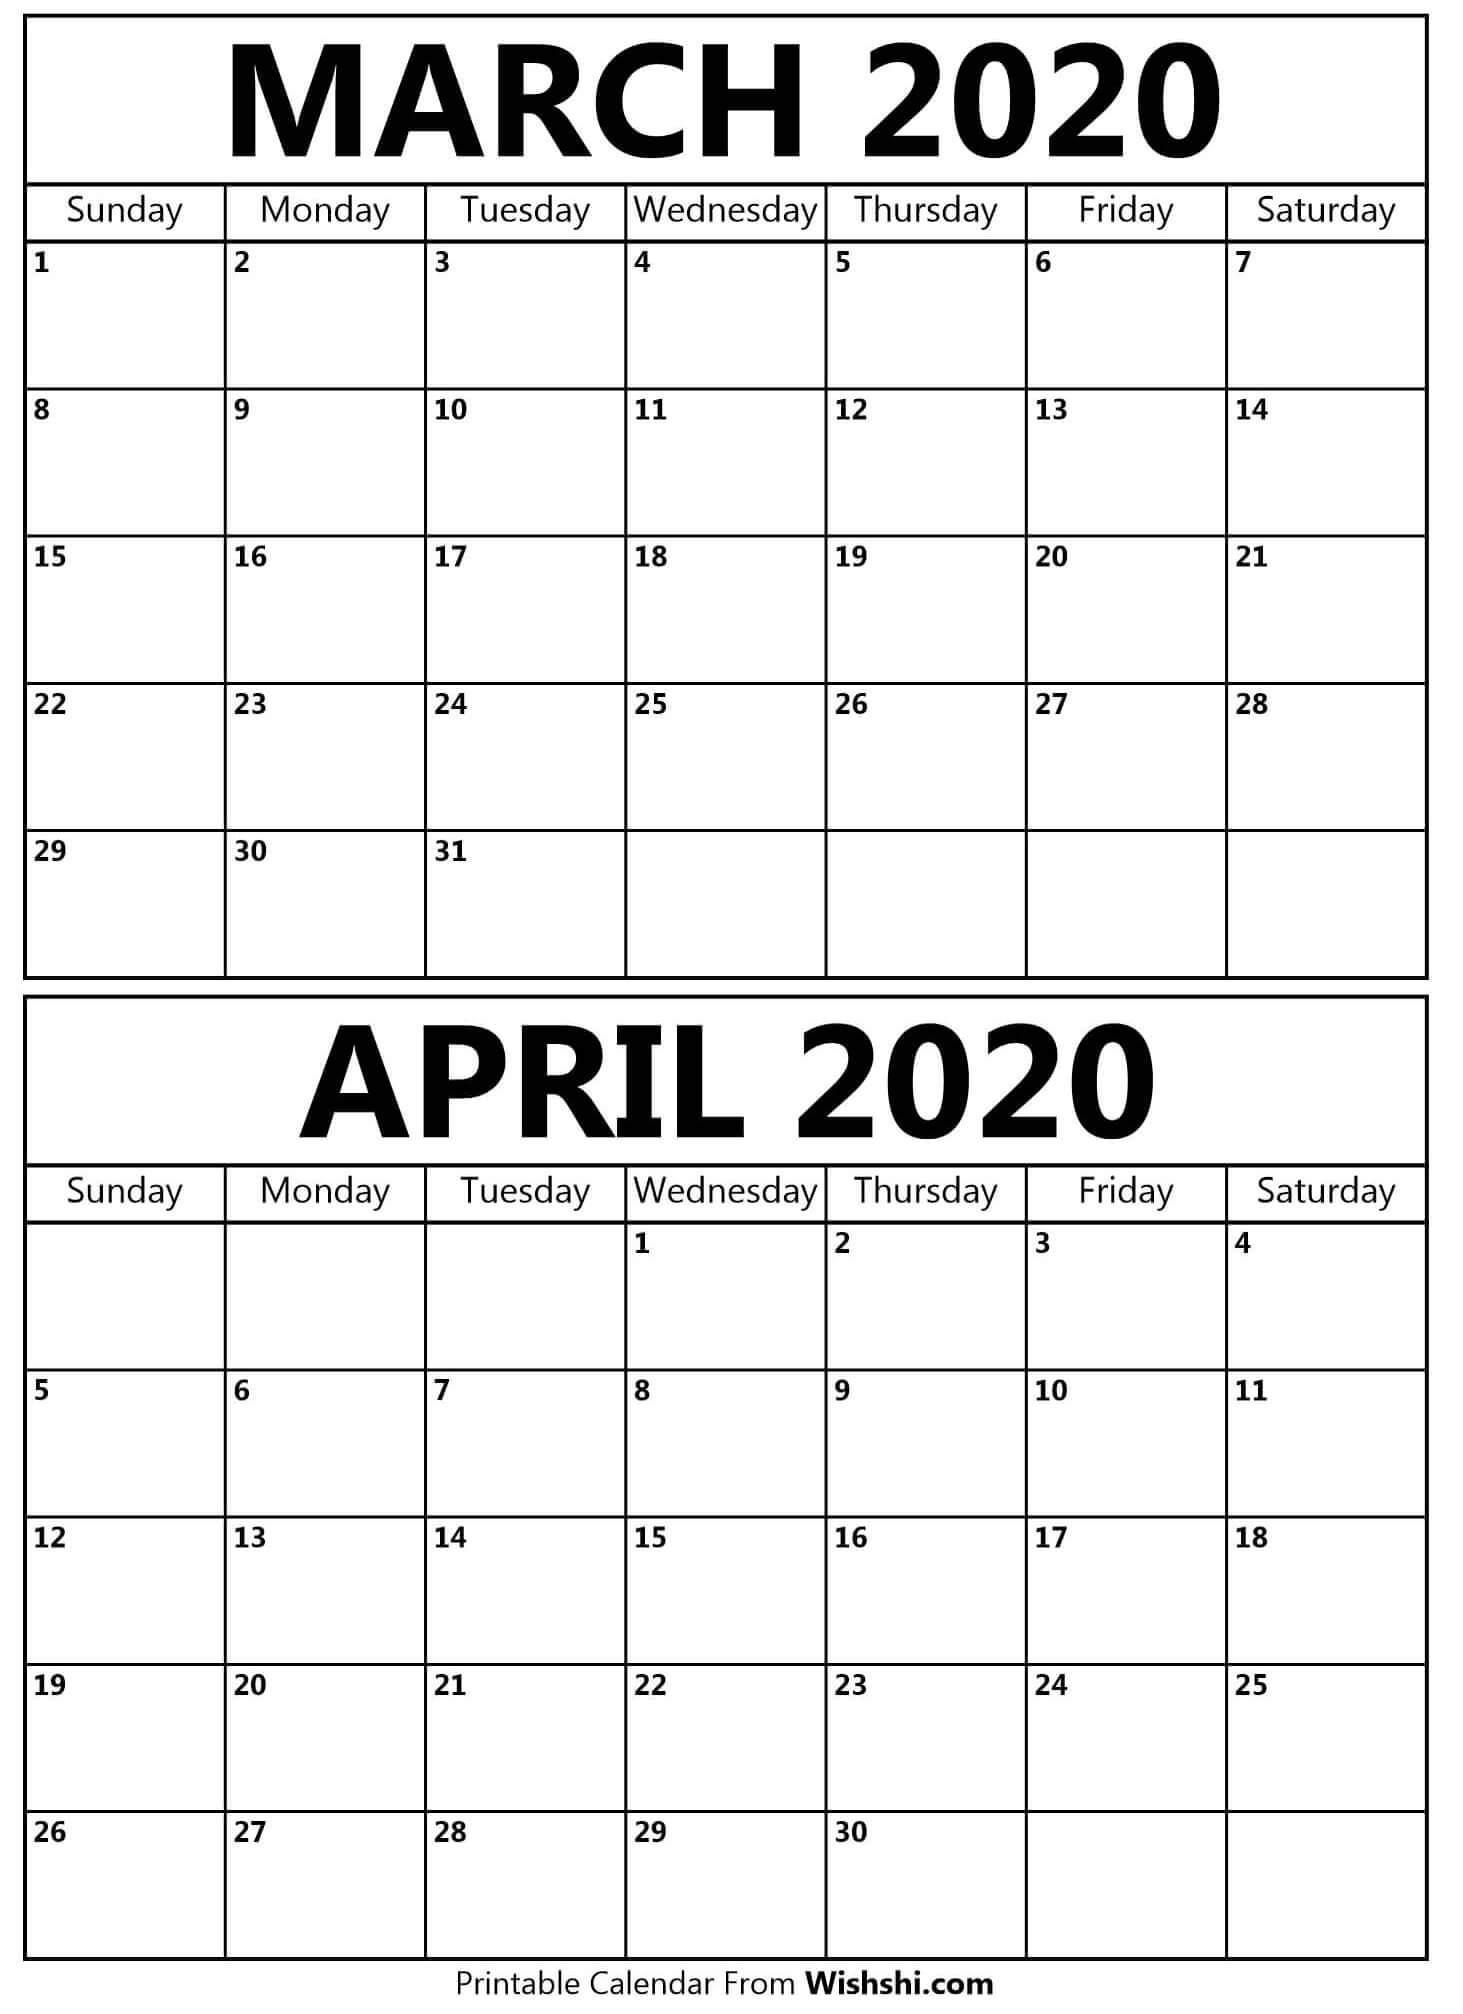 Printable March April 2020 Calendar - Free Printable